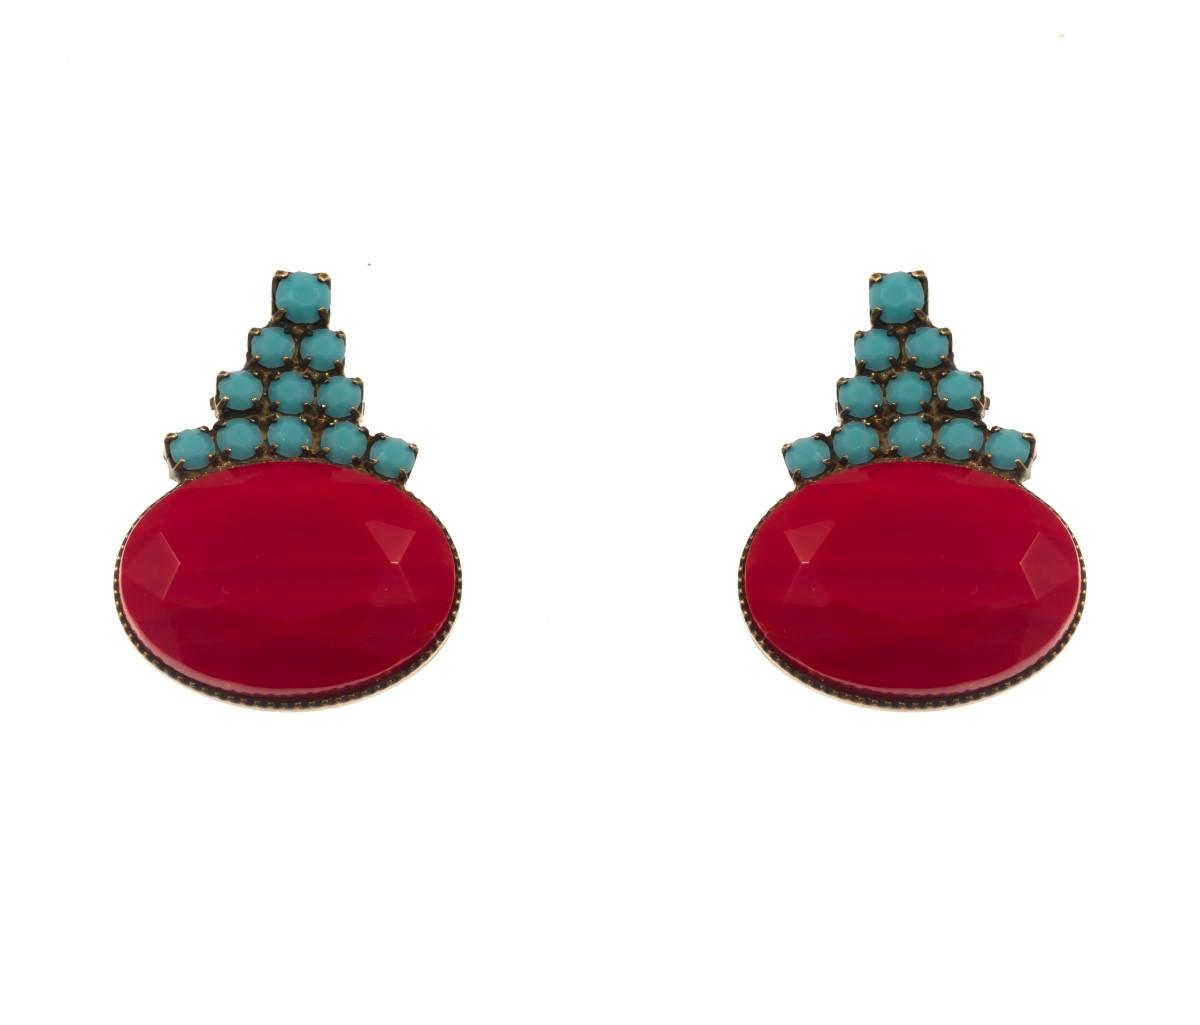 ARTWEAR DIMITRIADIS - Γυναικεία σκουλαρίκια ARTWEAR DIMITRIADIS με στρας & πέτρα γυναικεία αξεσουάρ κοσμήματα σκουλαρίκια